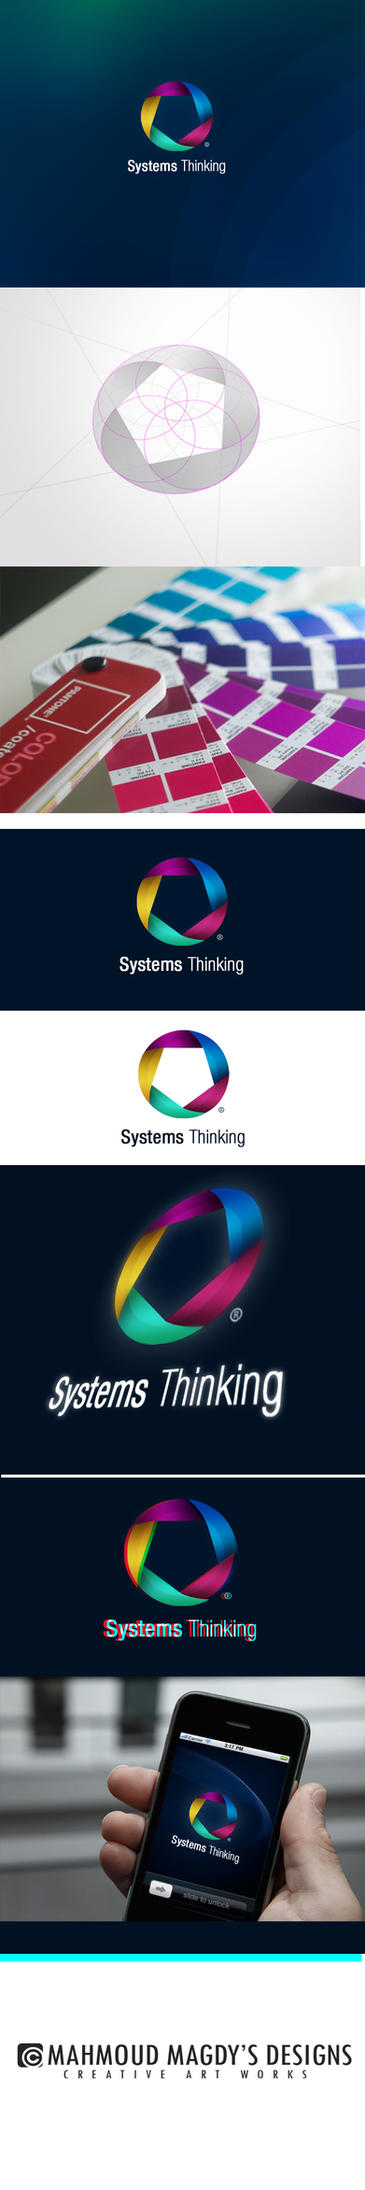 Systems thinking logo by 7oooda